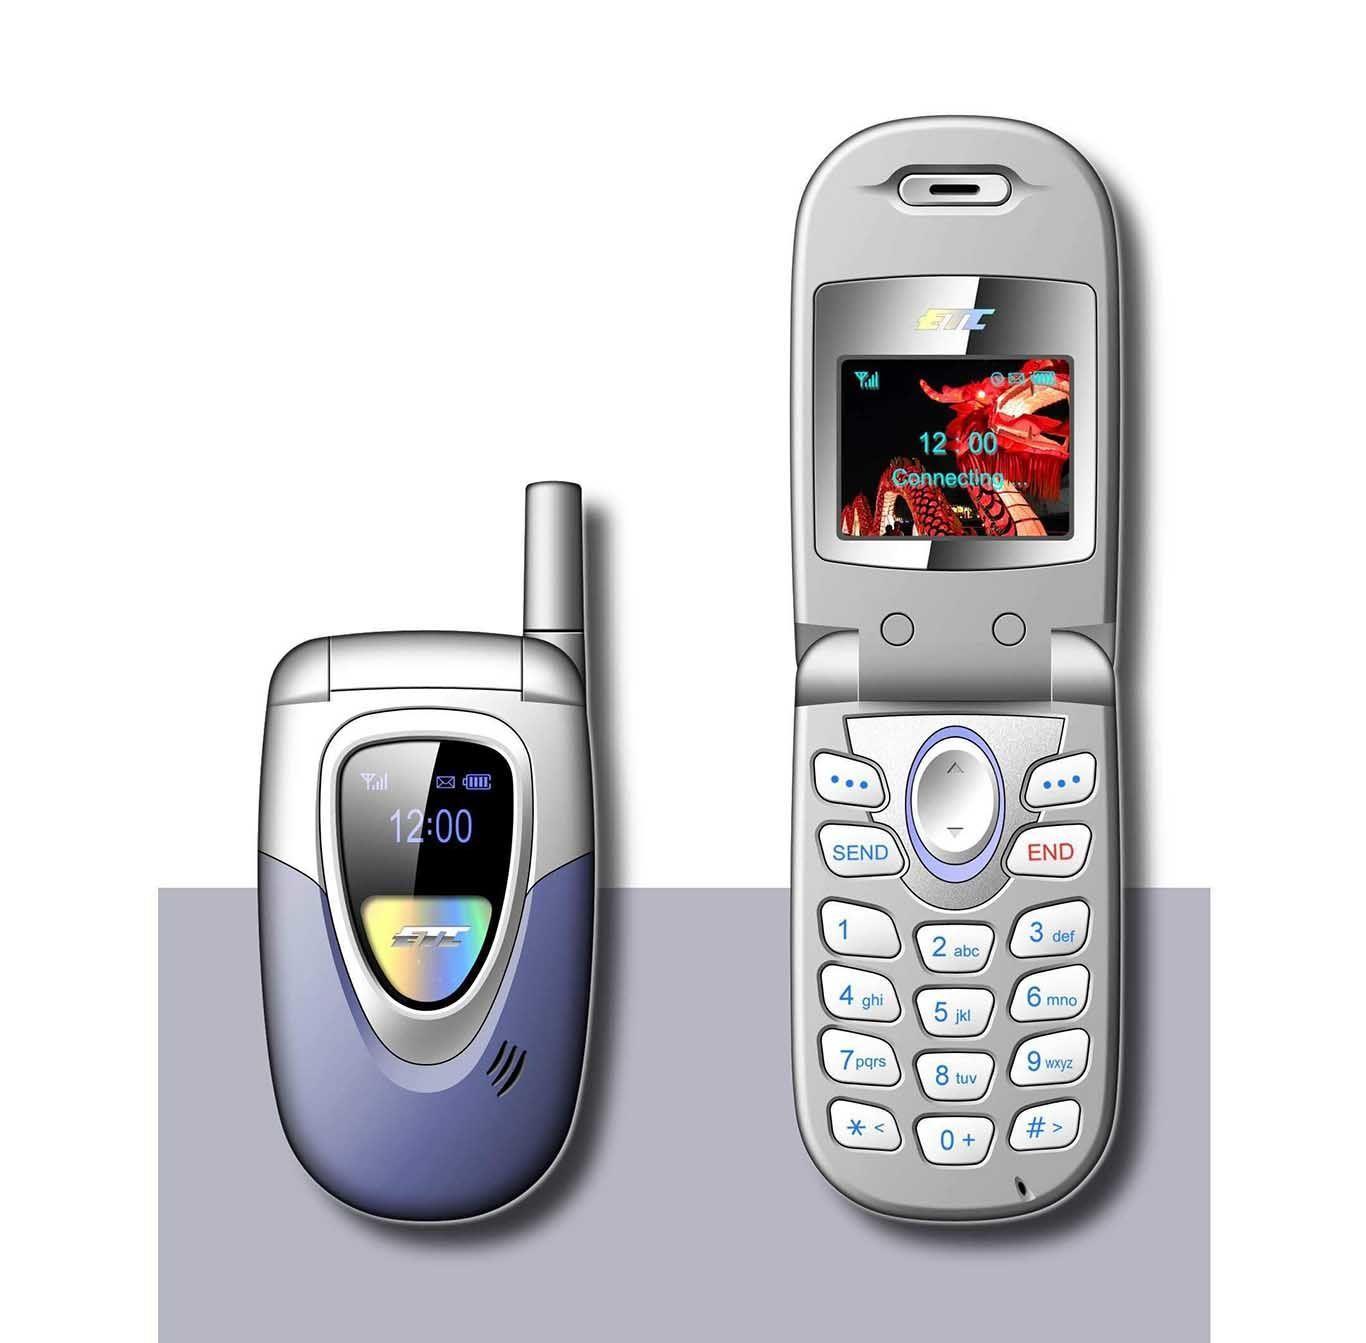 6 Handphone Ini Pernah Tenar di Masanya